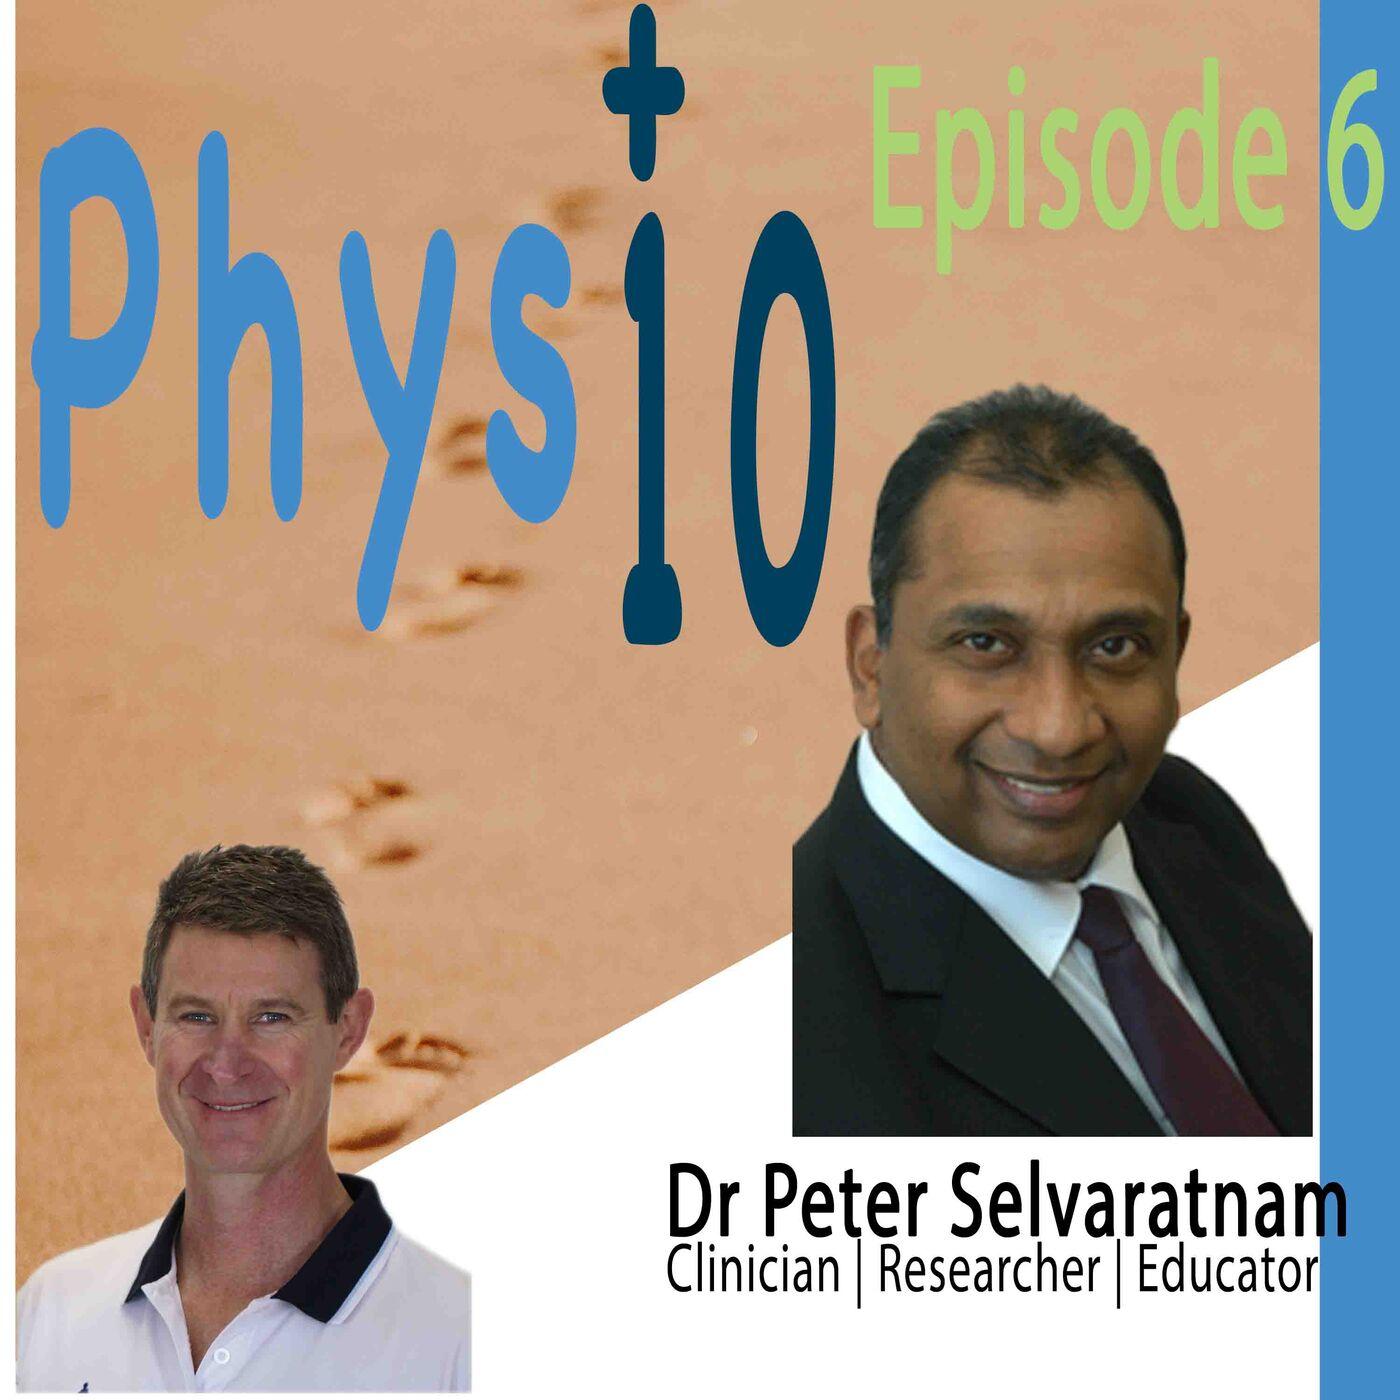 Dr Peter Selvaratnam: Clinician | Author | Educator